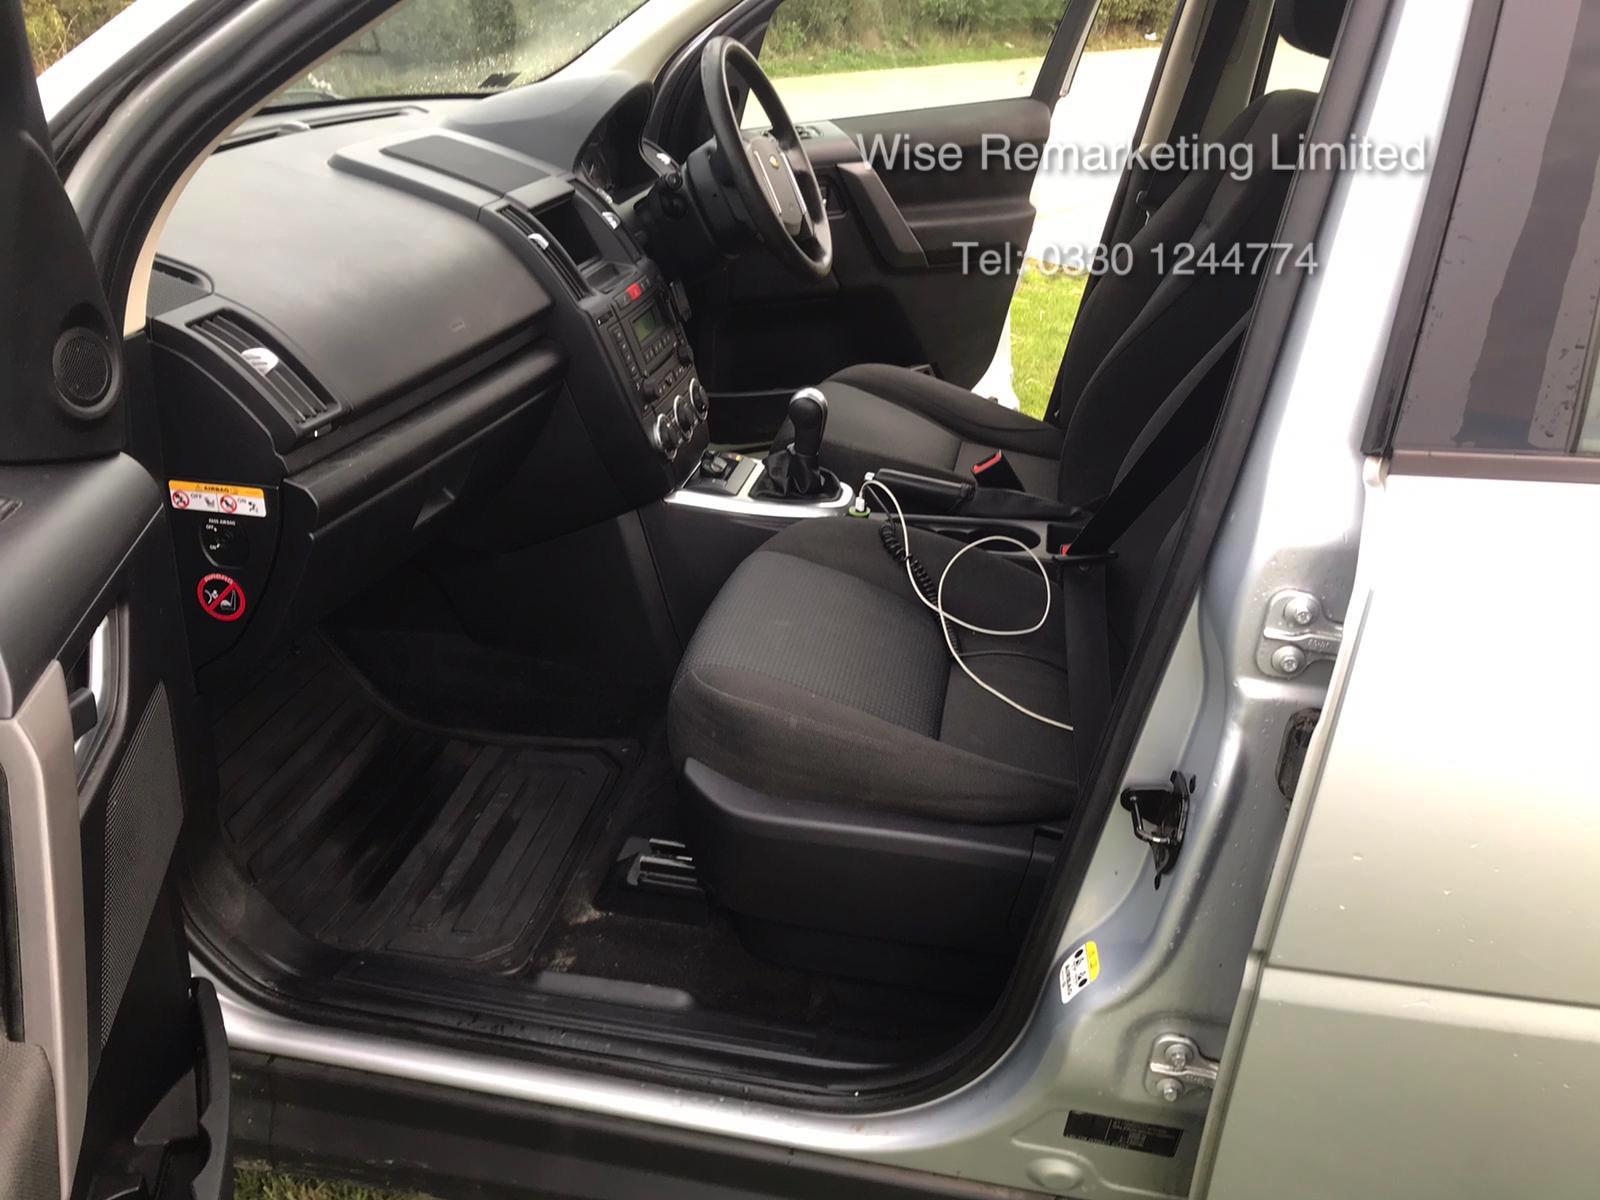 Lot 41 - Land Rover Freelander 2.2 TD4 E - 2009 - Service History - 4x4